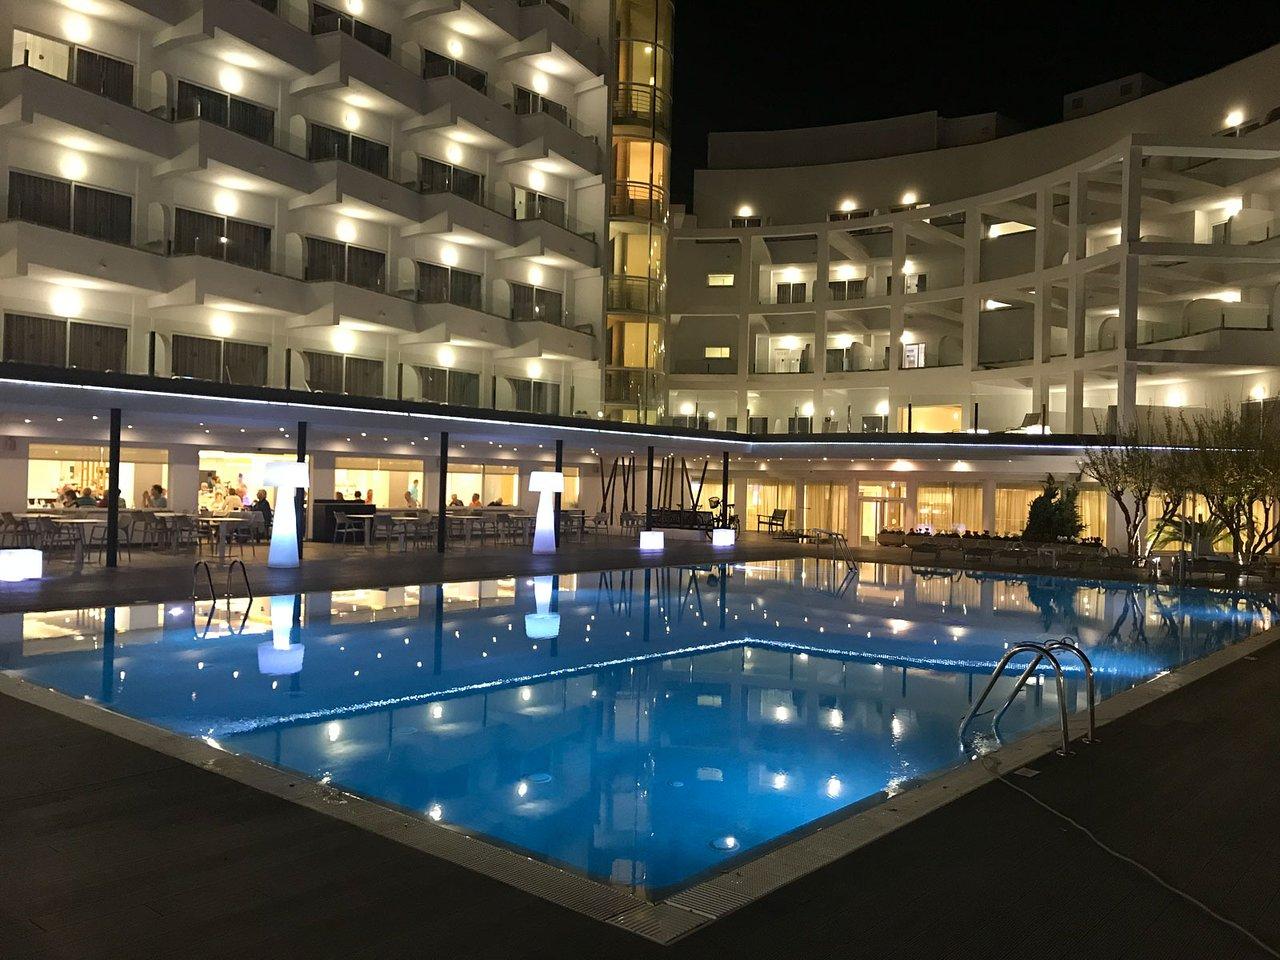 Grupotel Acapulco Playa - instalación - piscina - Globatecnic